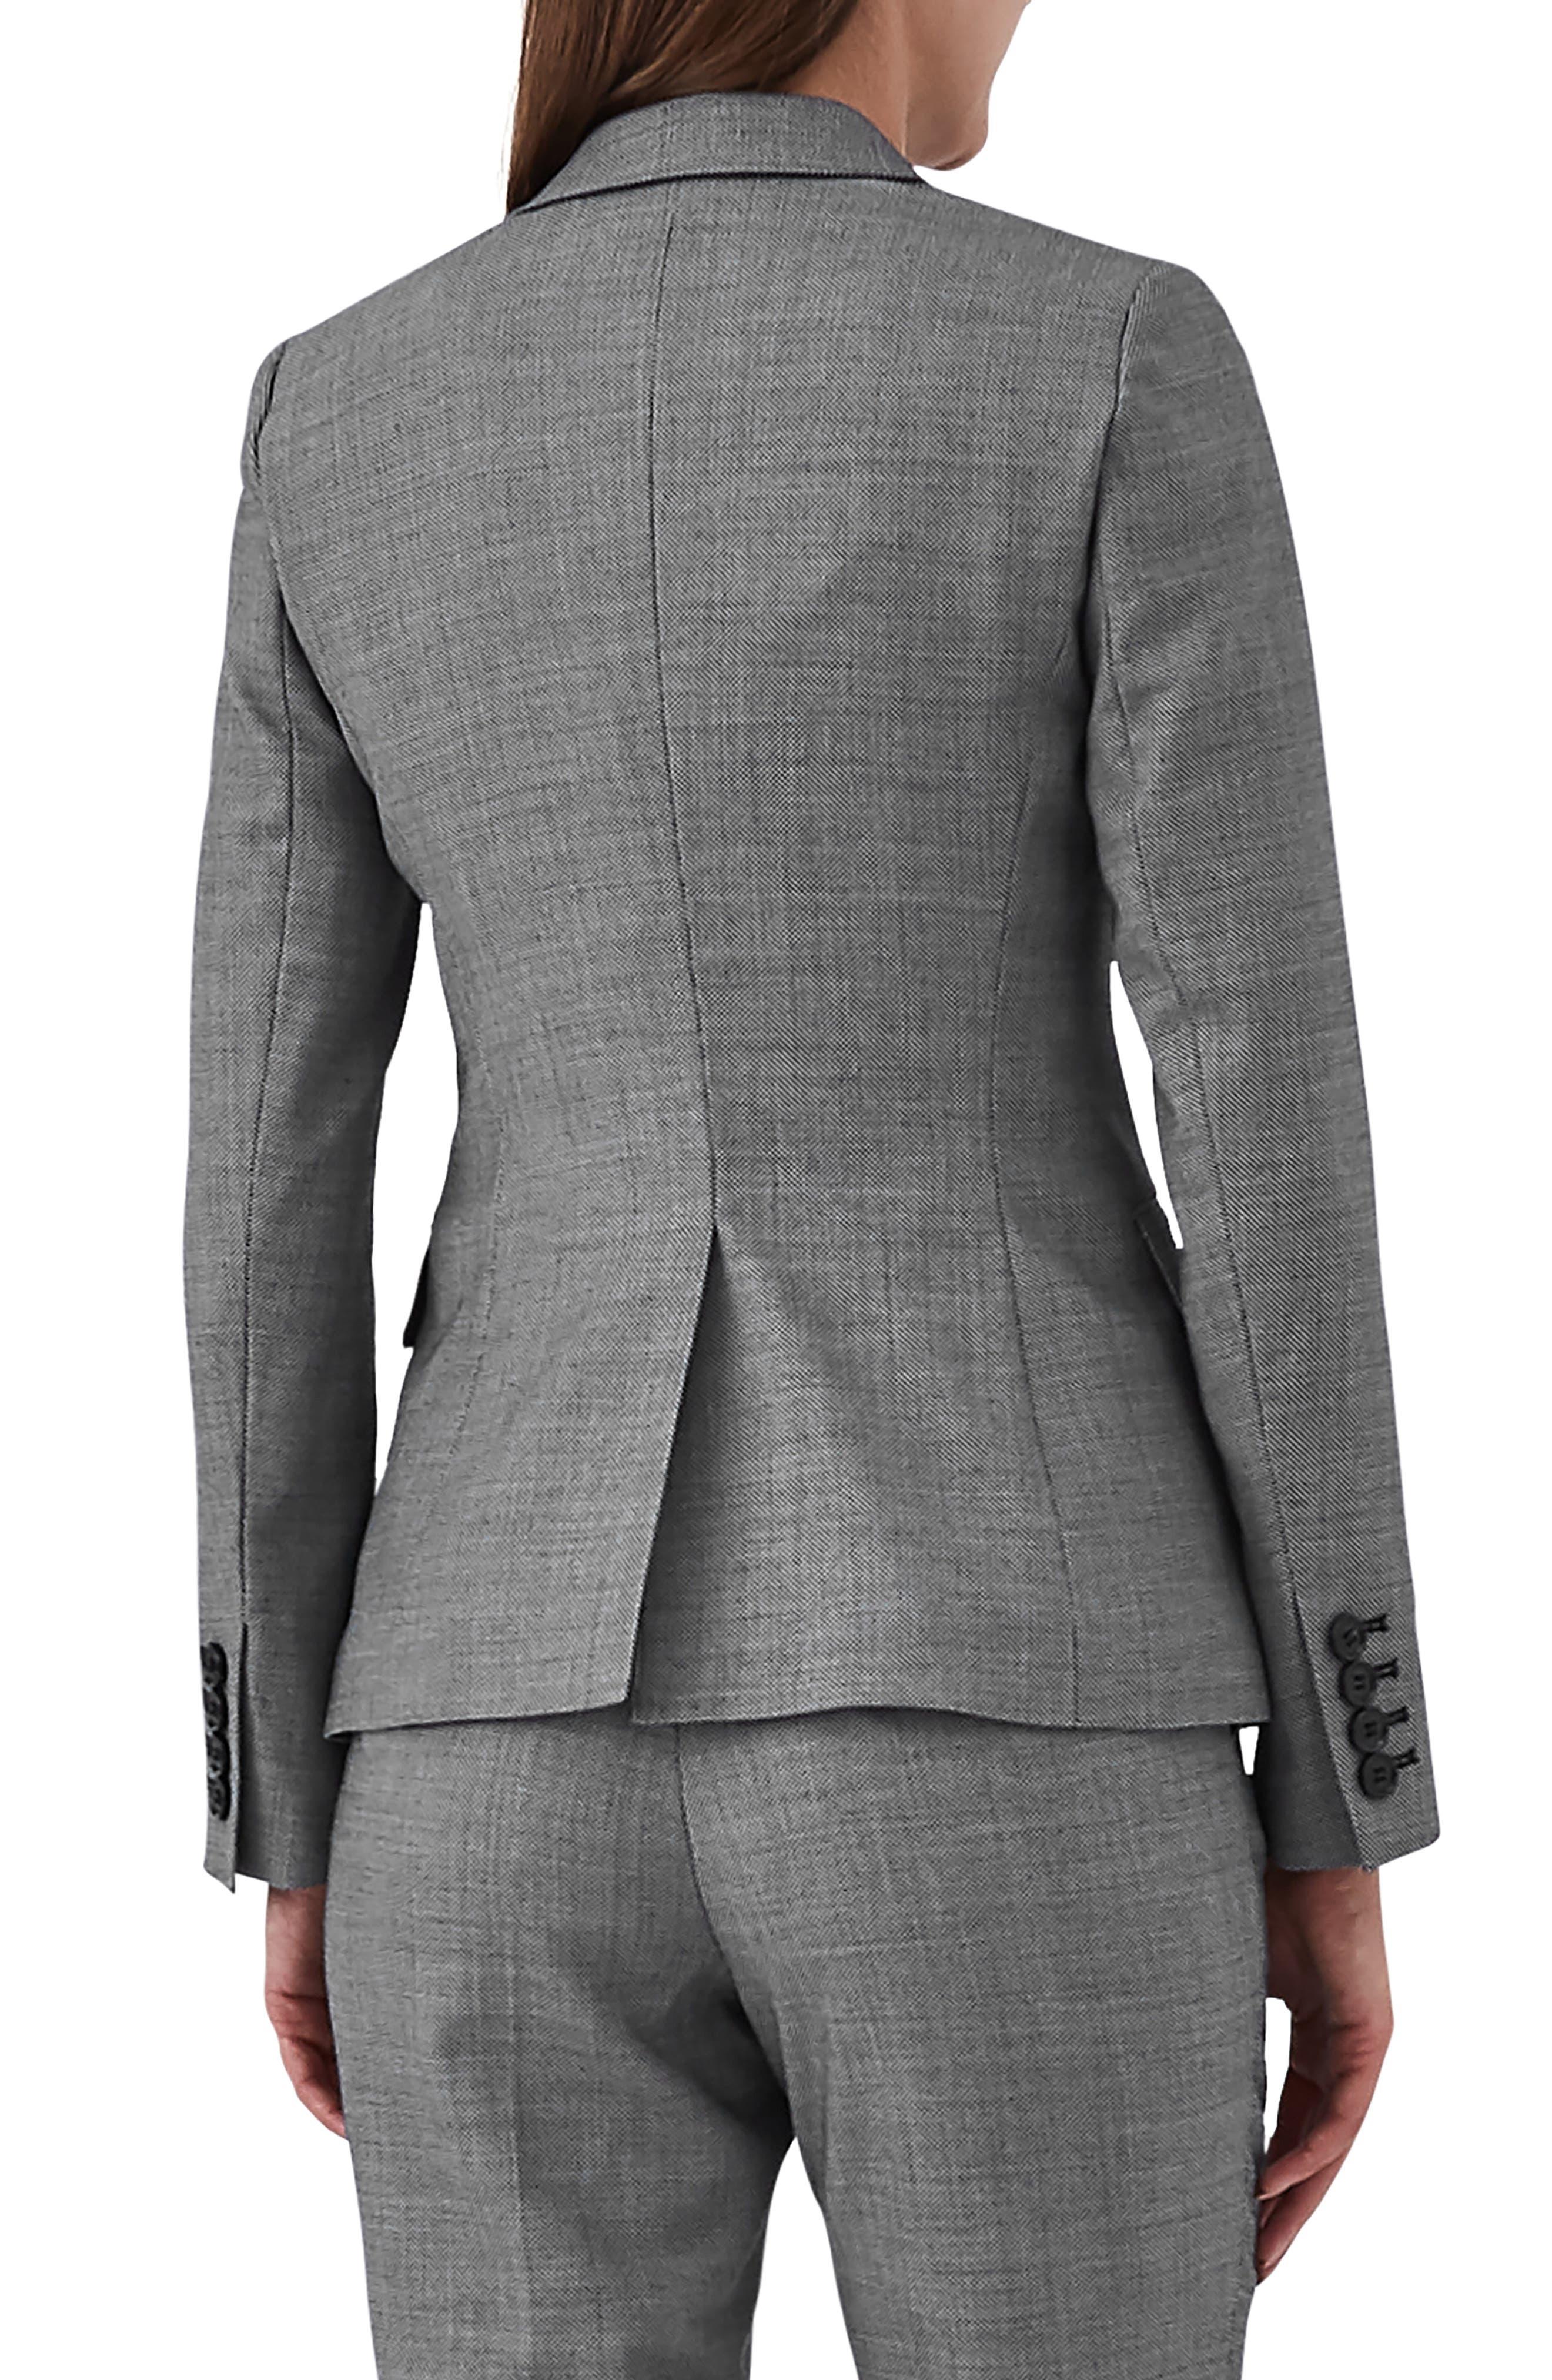 Alber Tweed Stretch Wool Blend Blazer,                             Alternate thumbnail 2, color,                             GREY